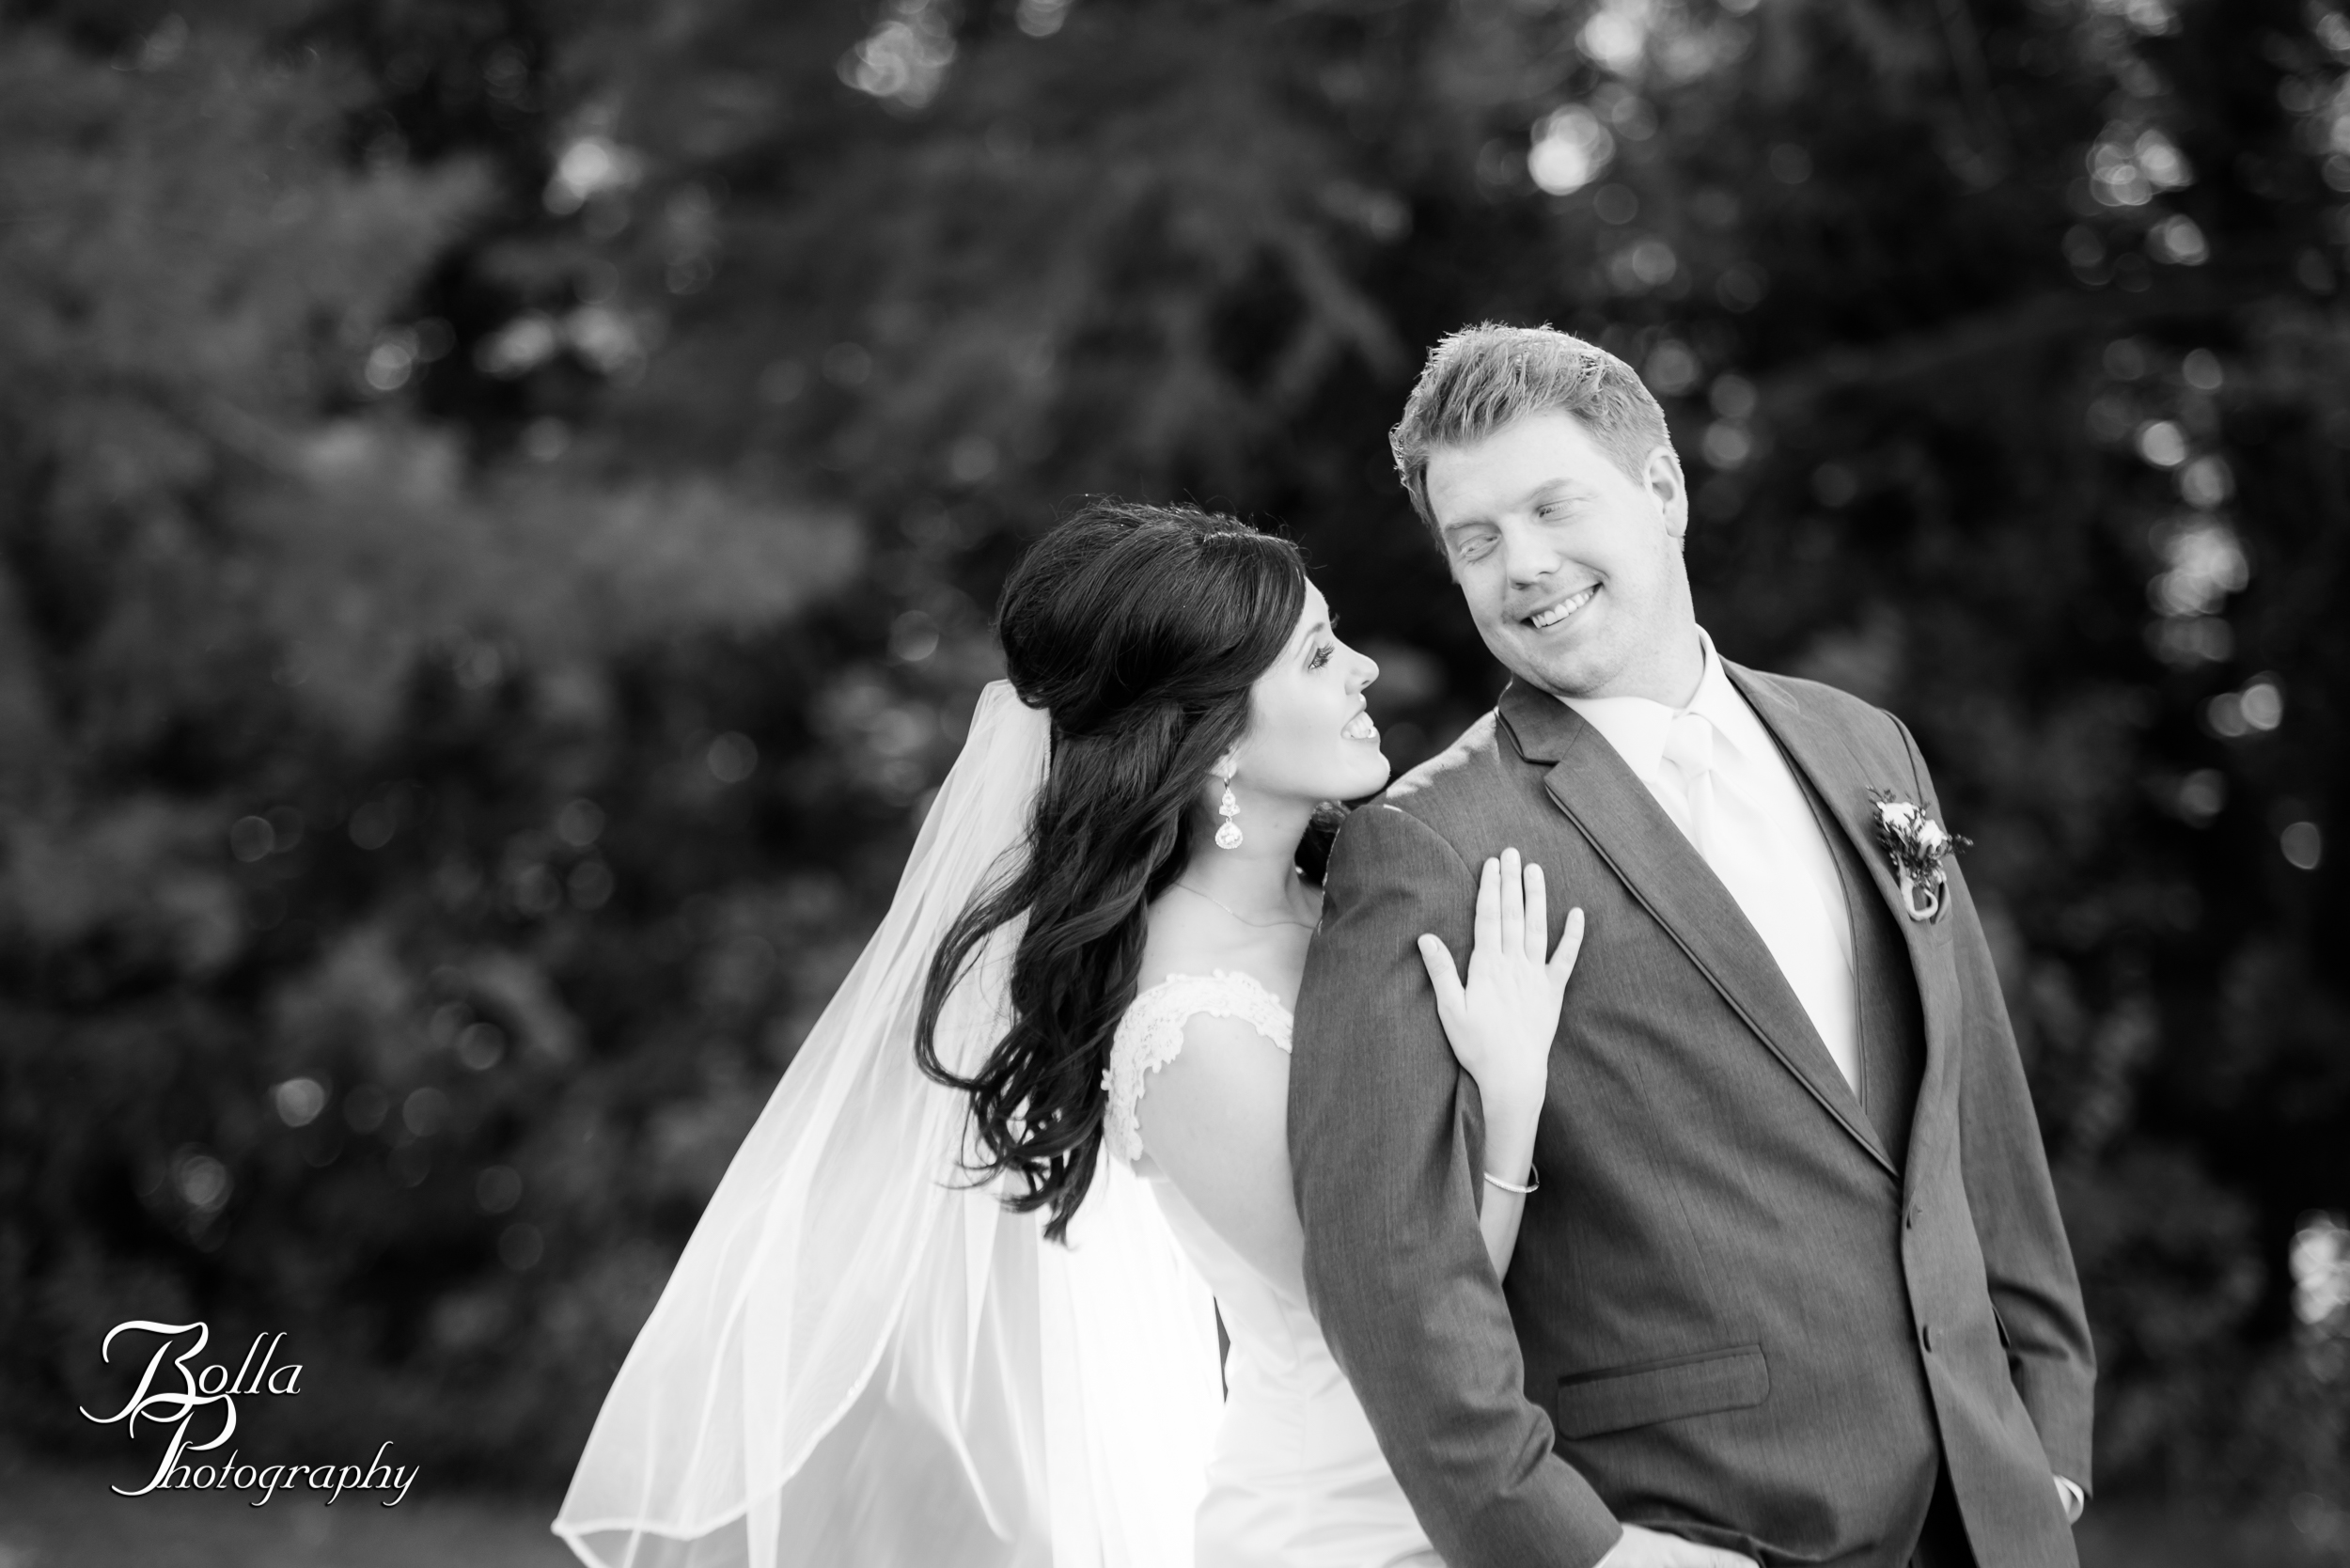 Bolla_photography_edwardsville_wedding_photographer_st_louis_weddings_Reilmann-0370.jpg